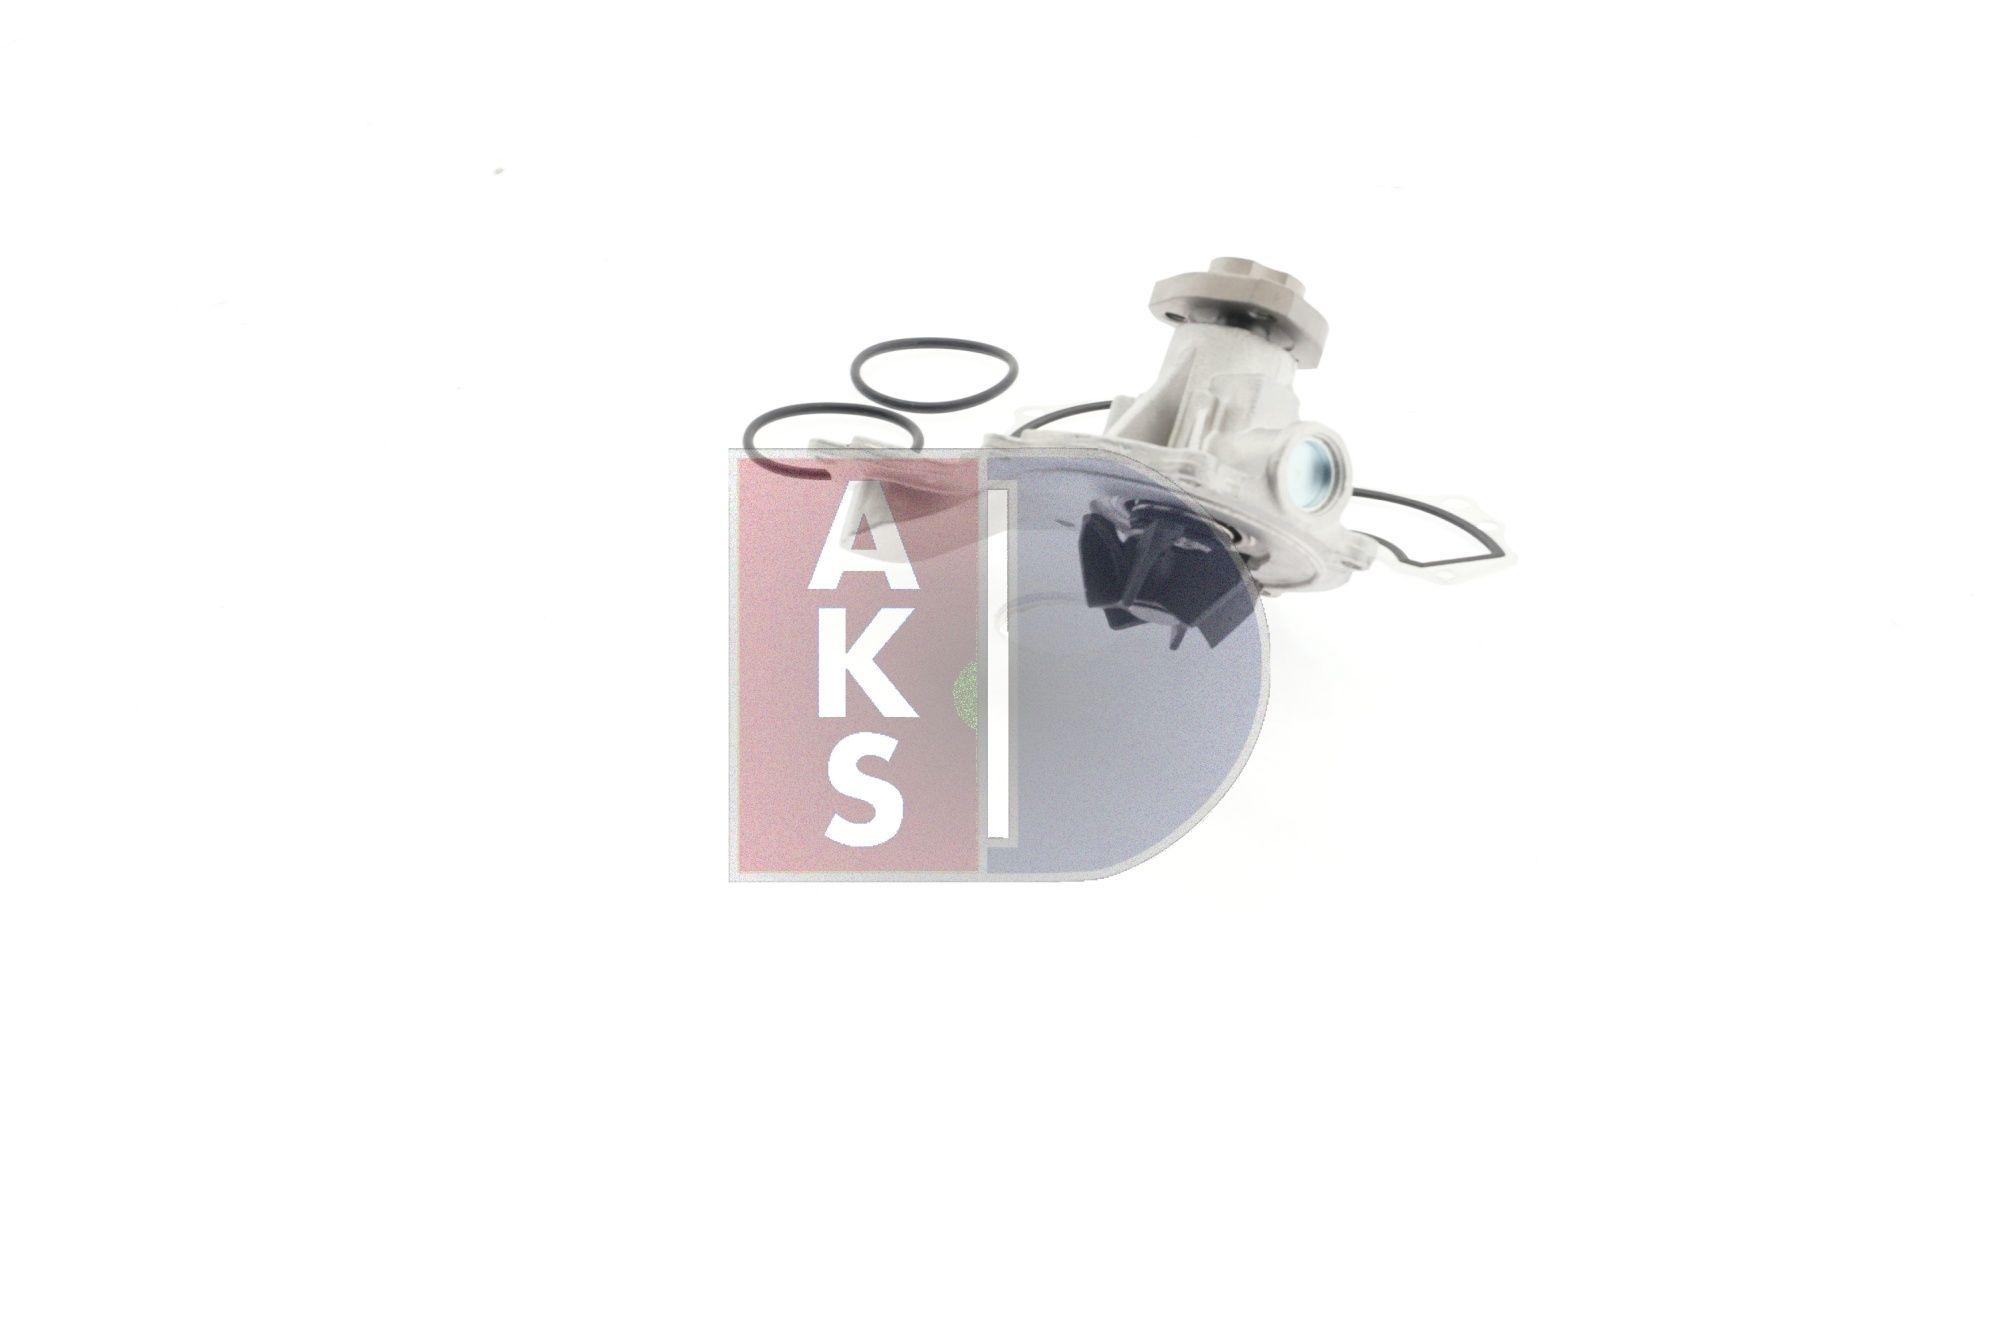 570004N Kühlwasserpumpe AKS DASIS - Markenprodukte billig